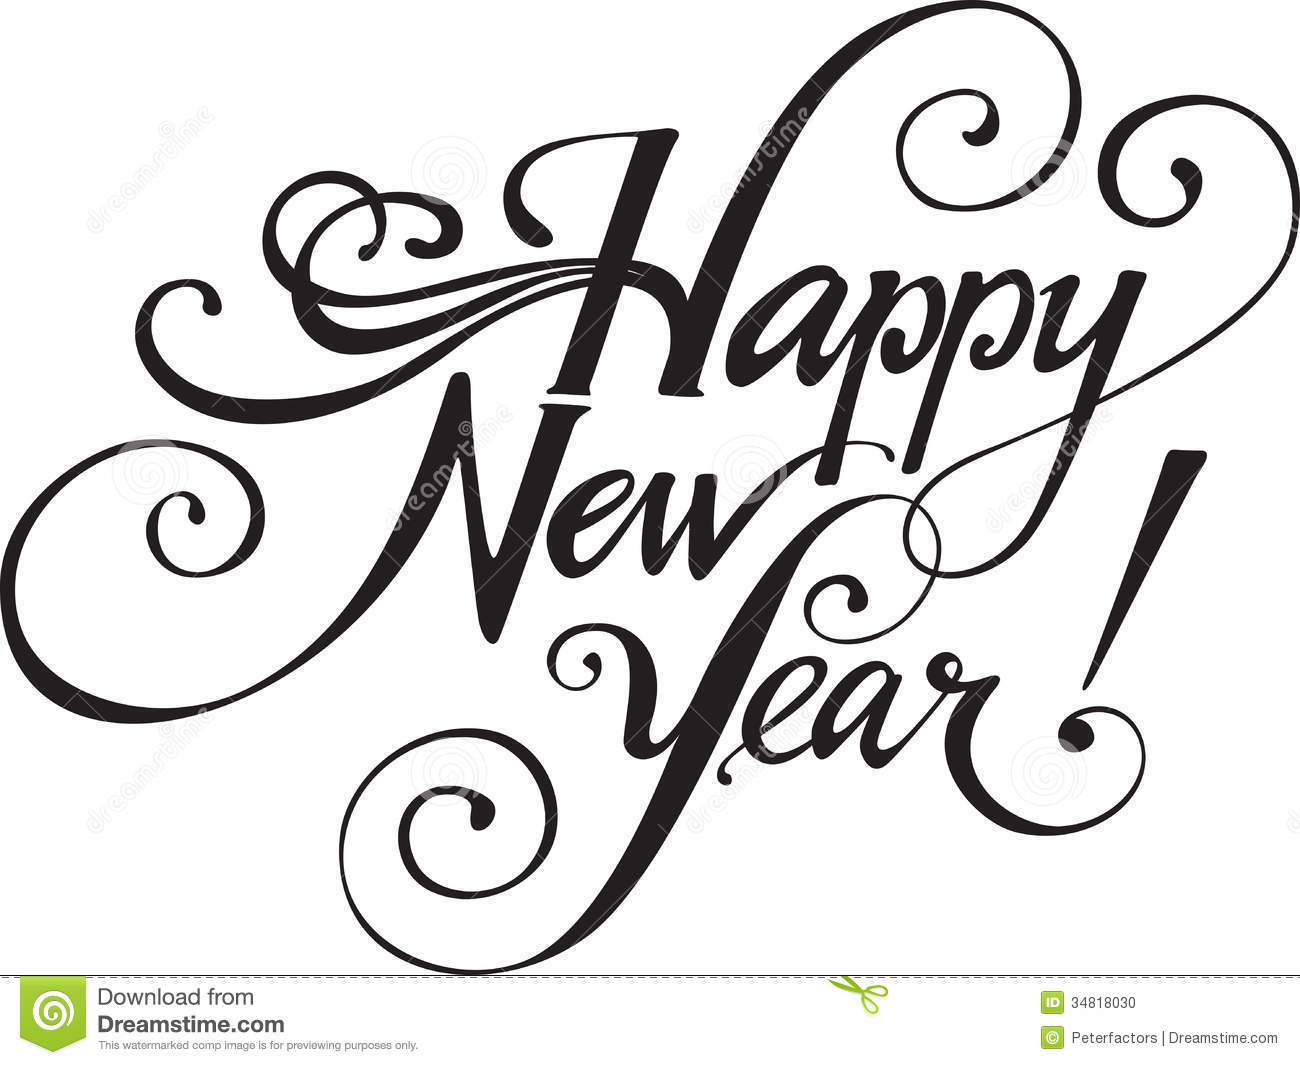 New Years 2014 Clip Art Black And White -New Years 2014 Clip Art Black And White New Year 2014 Clip Art-18